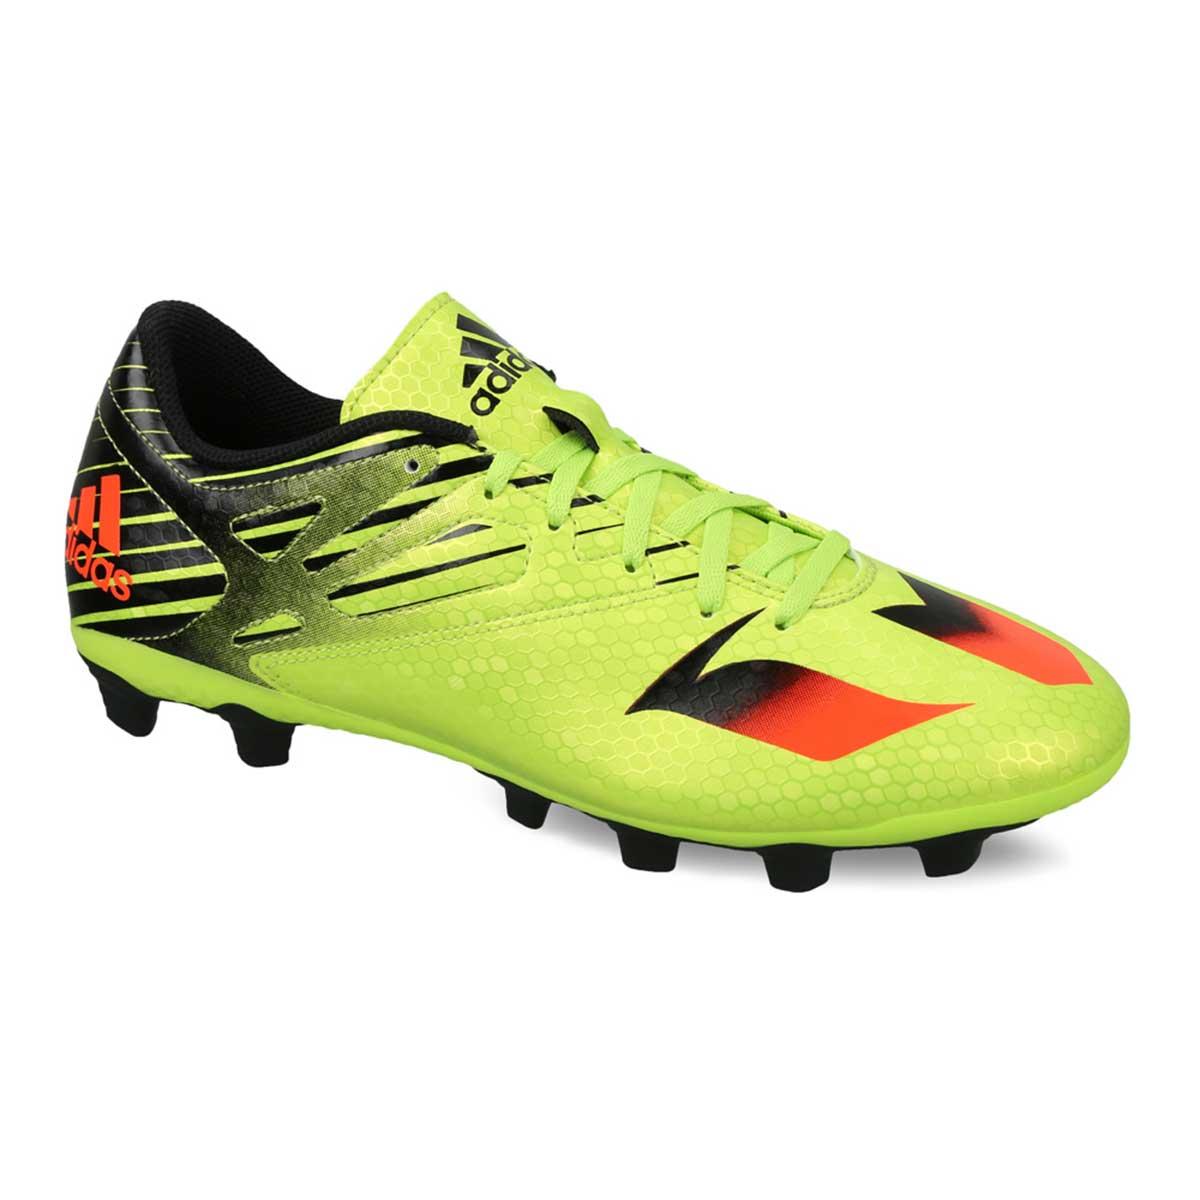 Buy Adidas Messi 15.4 FXG Football